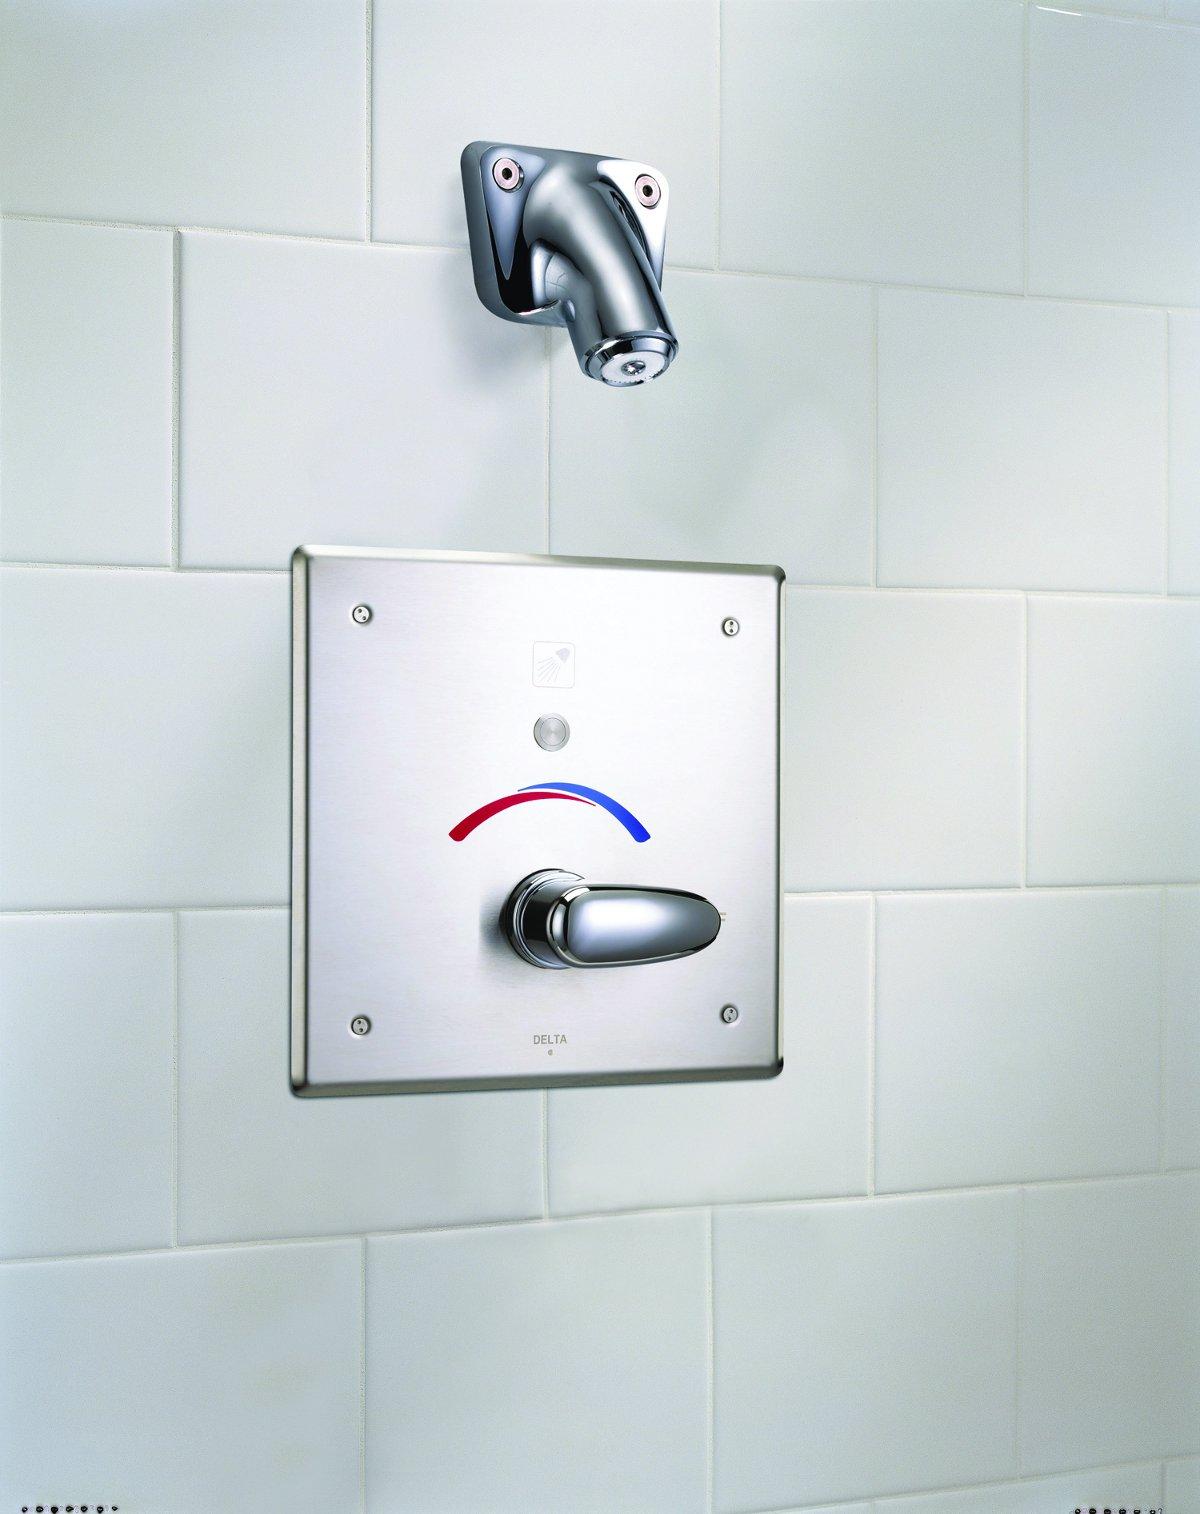 Delta+Commercial+-+860T+Electronic+Metering+Shower.jpg